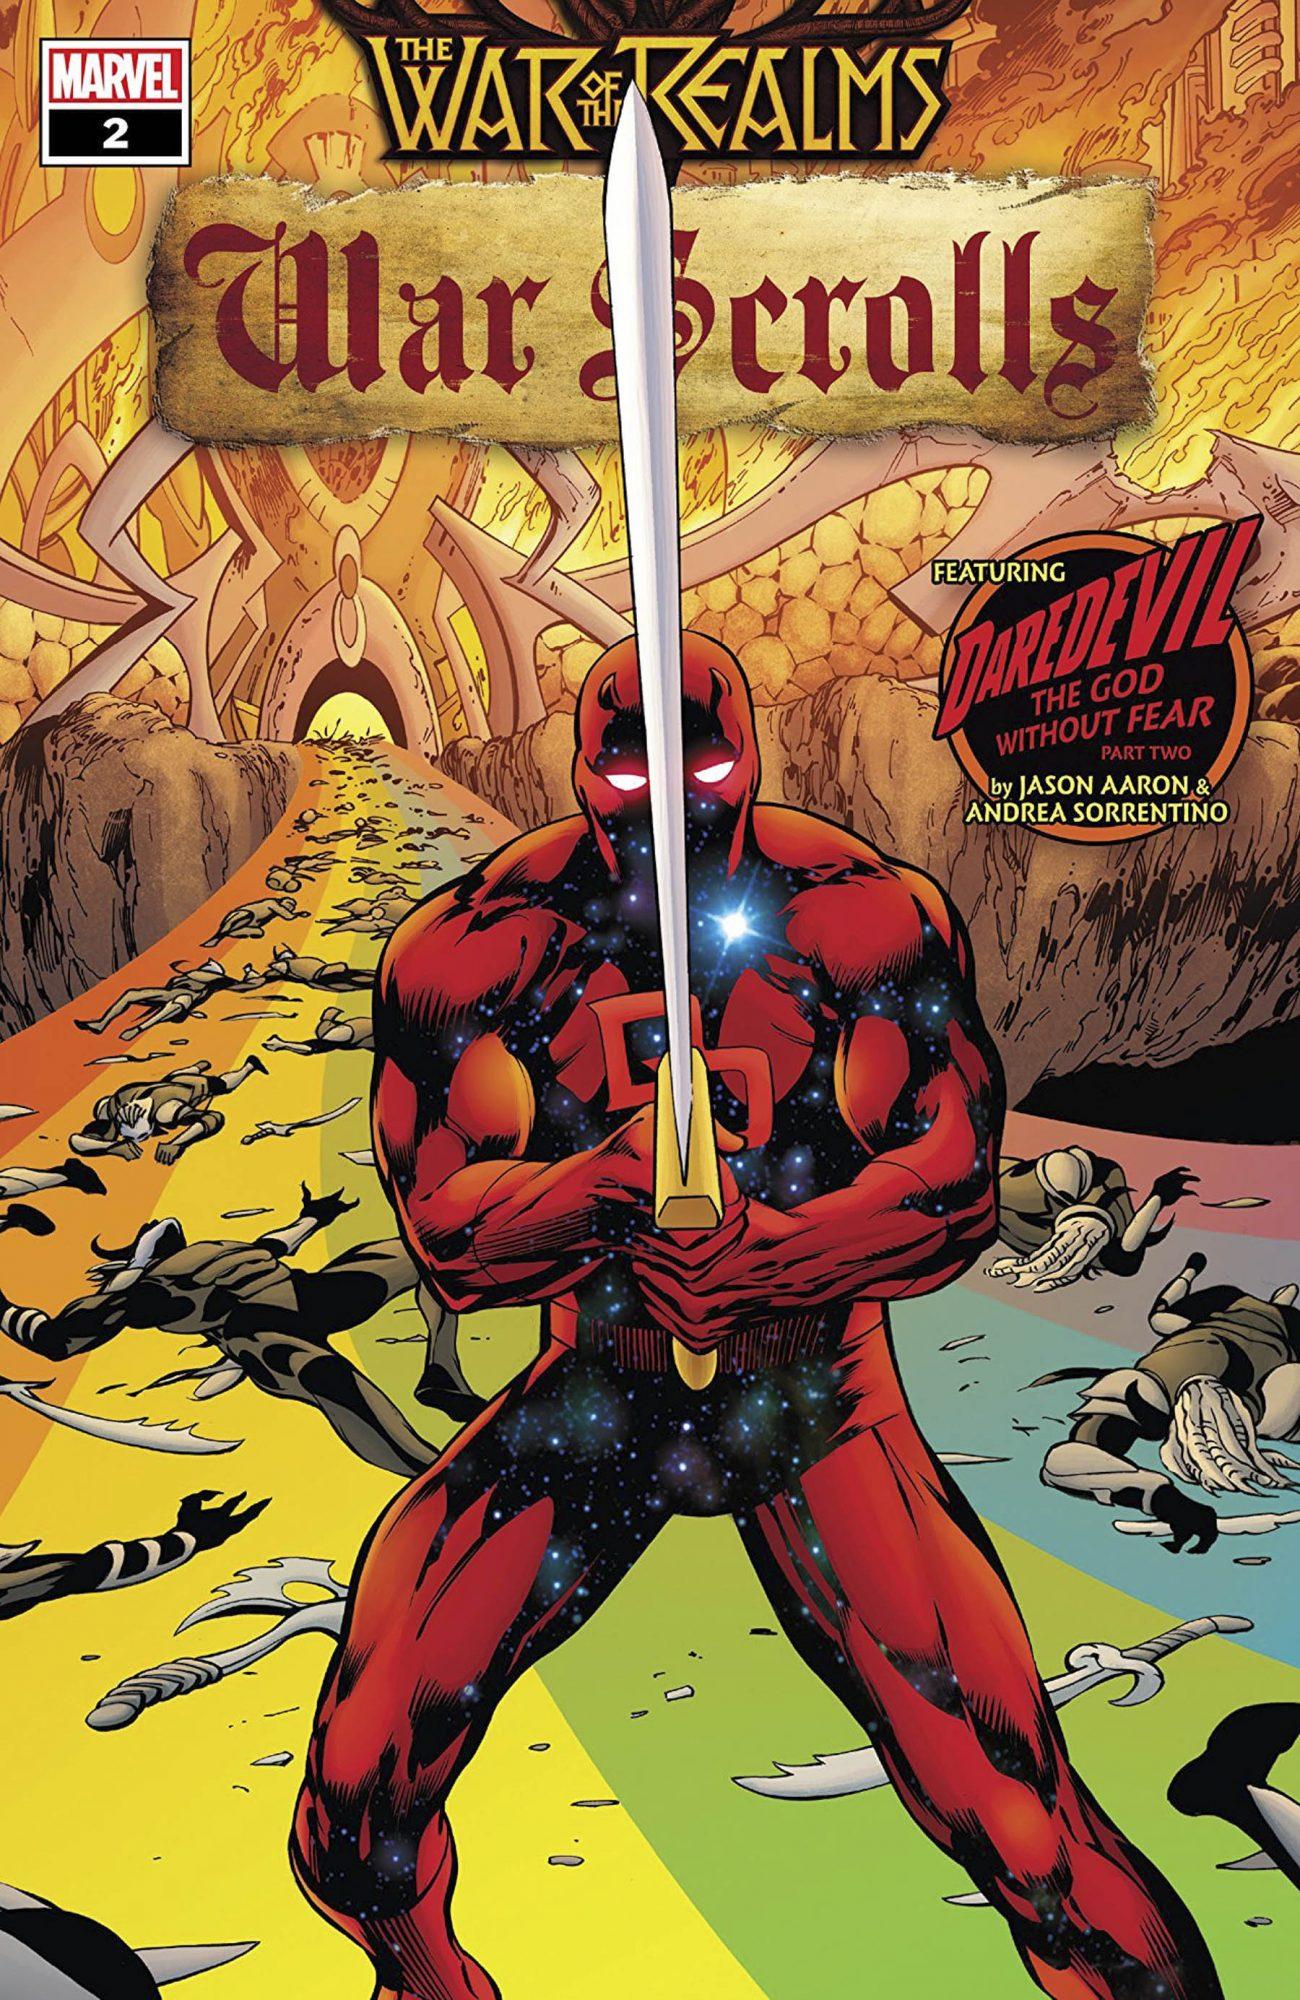 War Of The Realms: War Scrolls (2019-) #2 (of 3) CR: Marvel